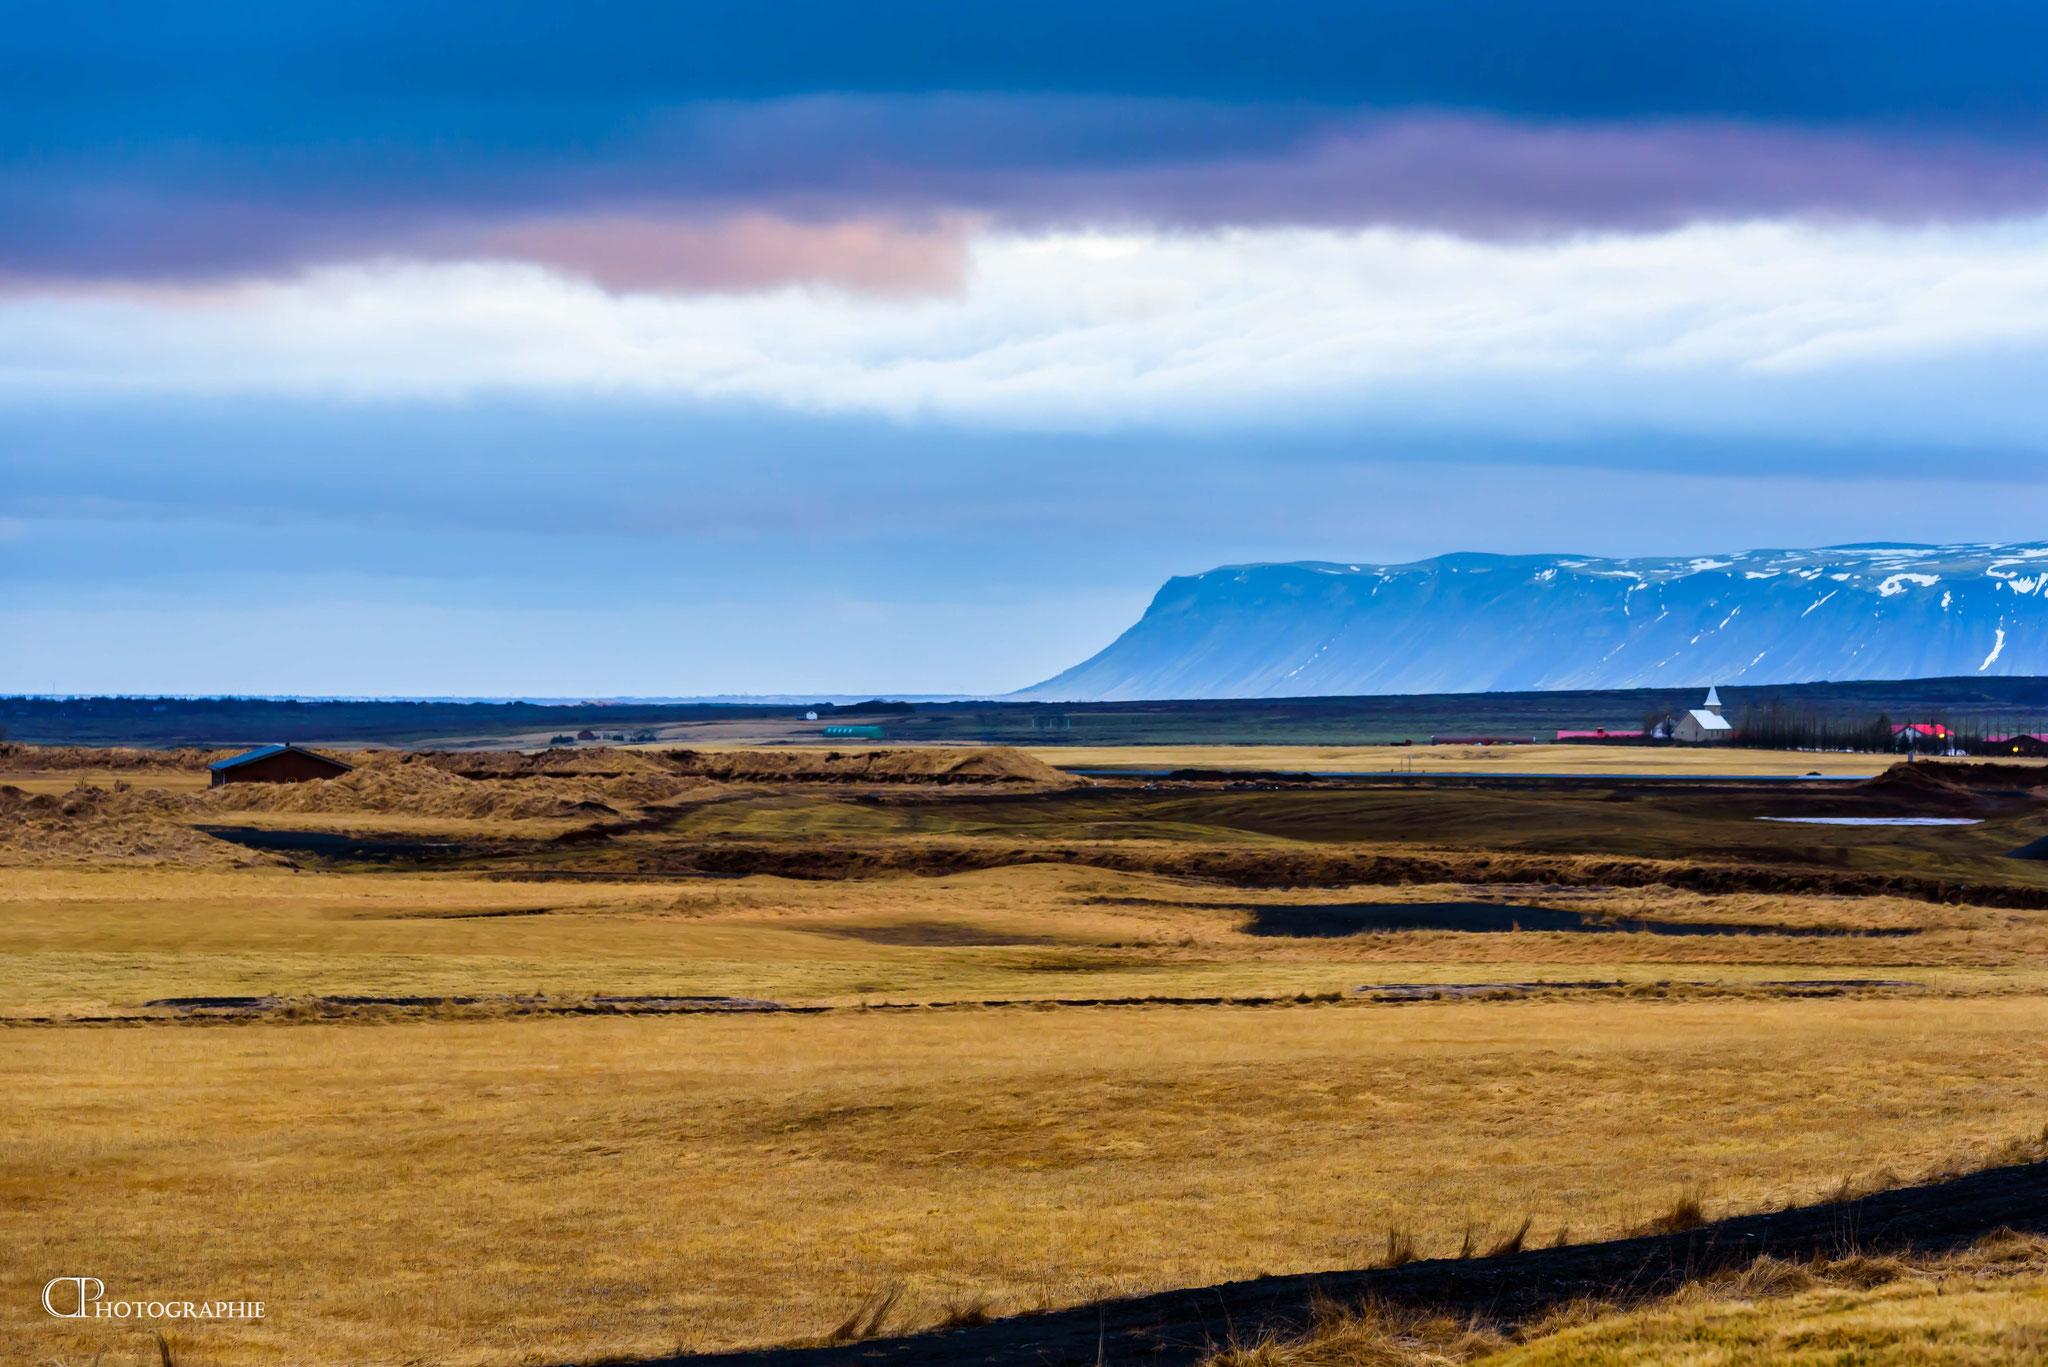 Photo 6 - Lueurs d'un soir en islande